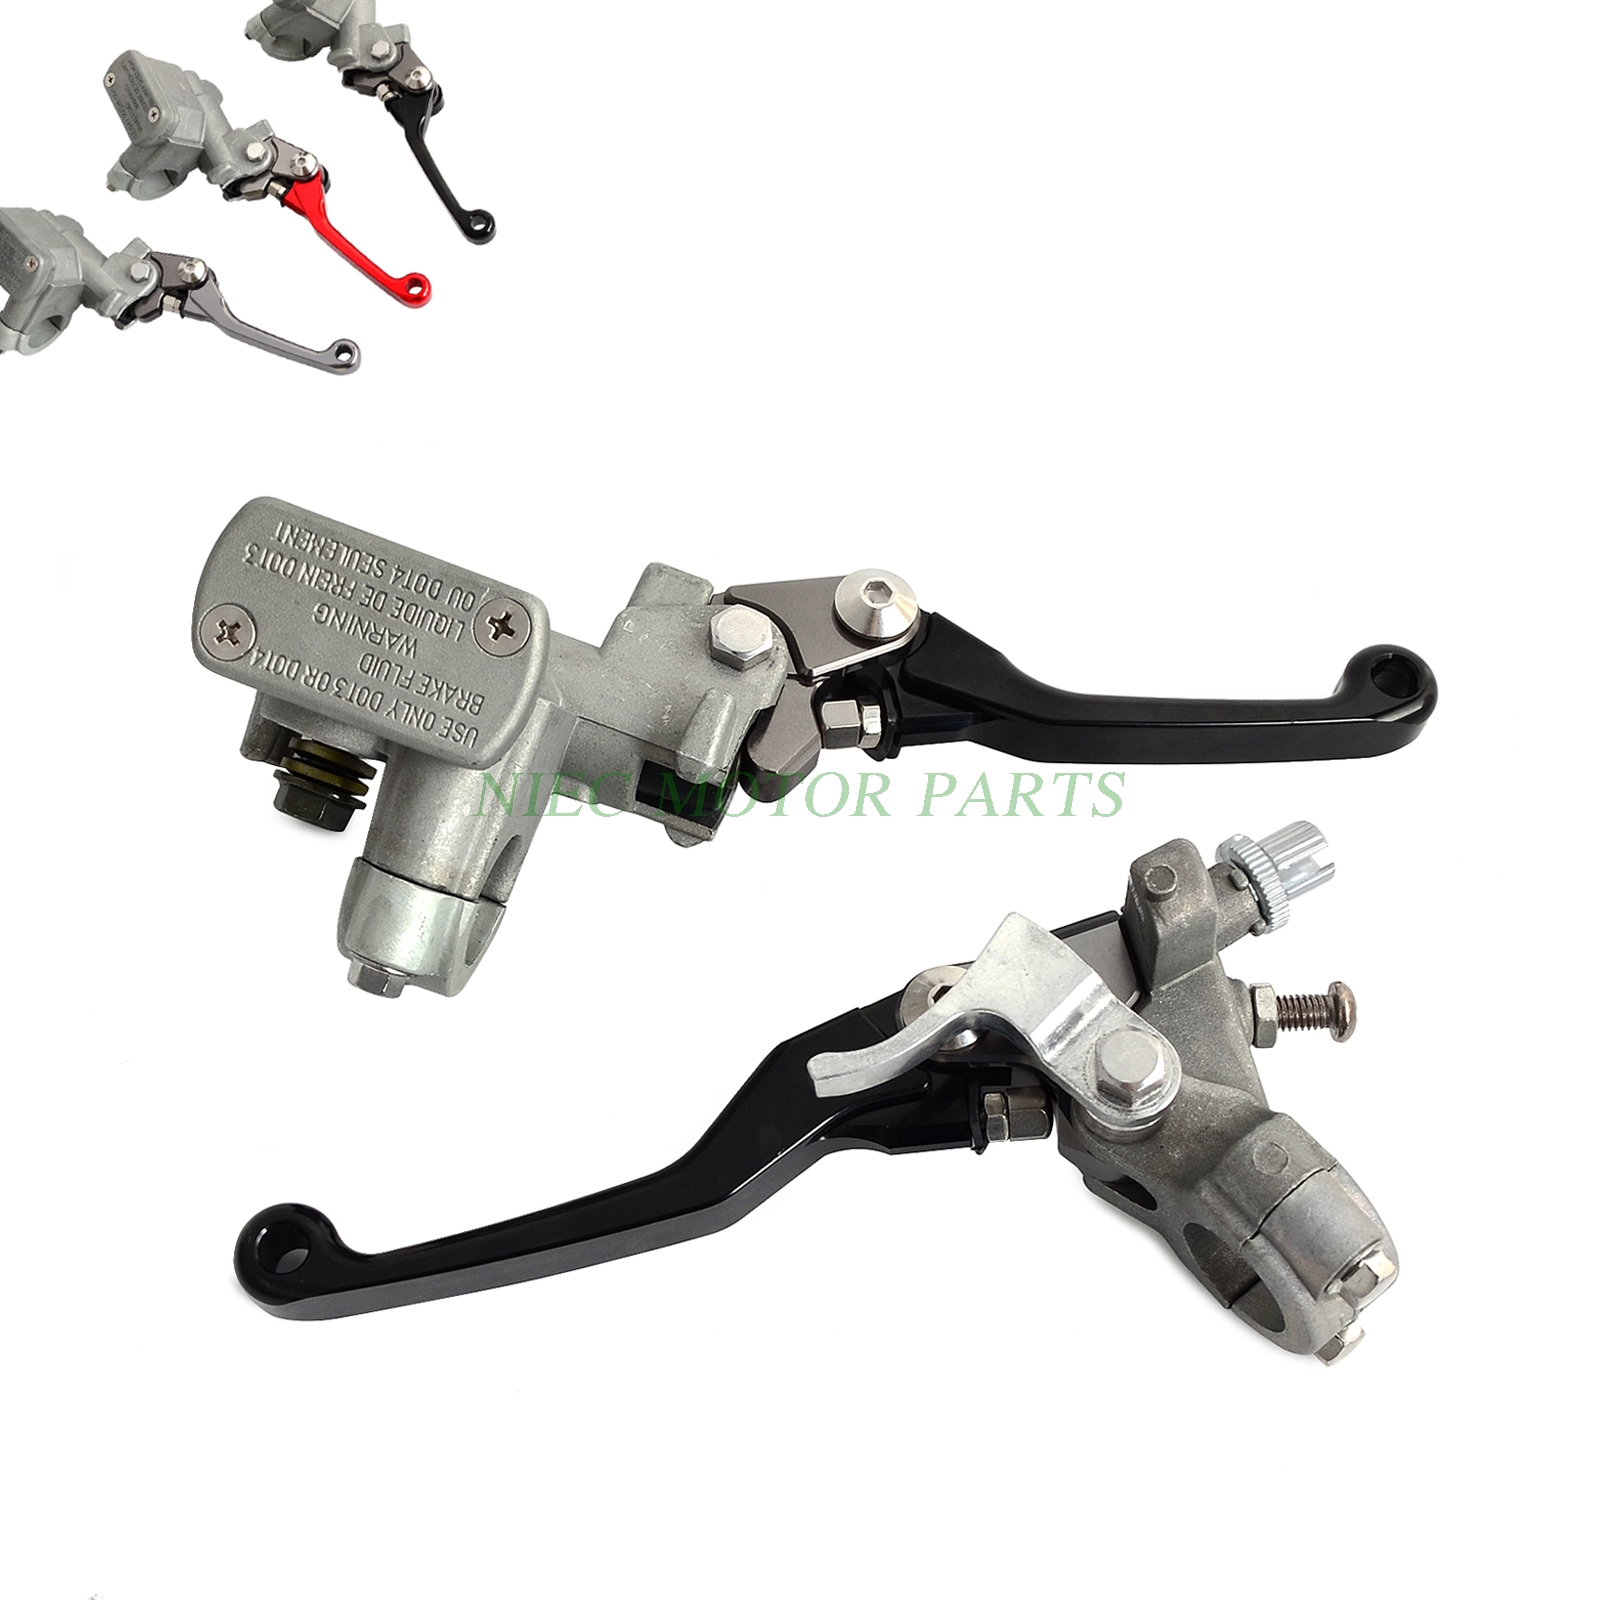 Brake Clutch Master Cylinder Lever For Honda CR125R CR250R 1996-2007 CRF250R/X 2004-2016 CRF450R 2002-2006 CR500R CRF150R коврик в багажник honda cr v 2002 2006 кросс полиуретан